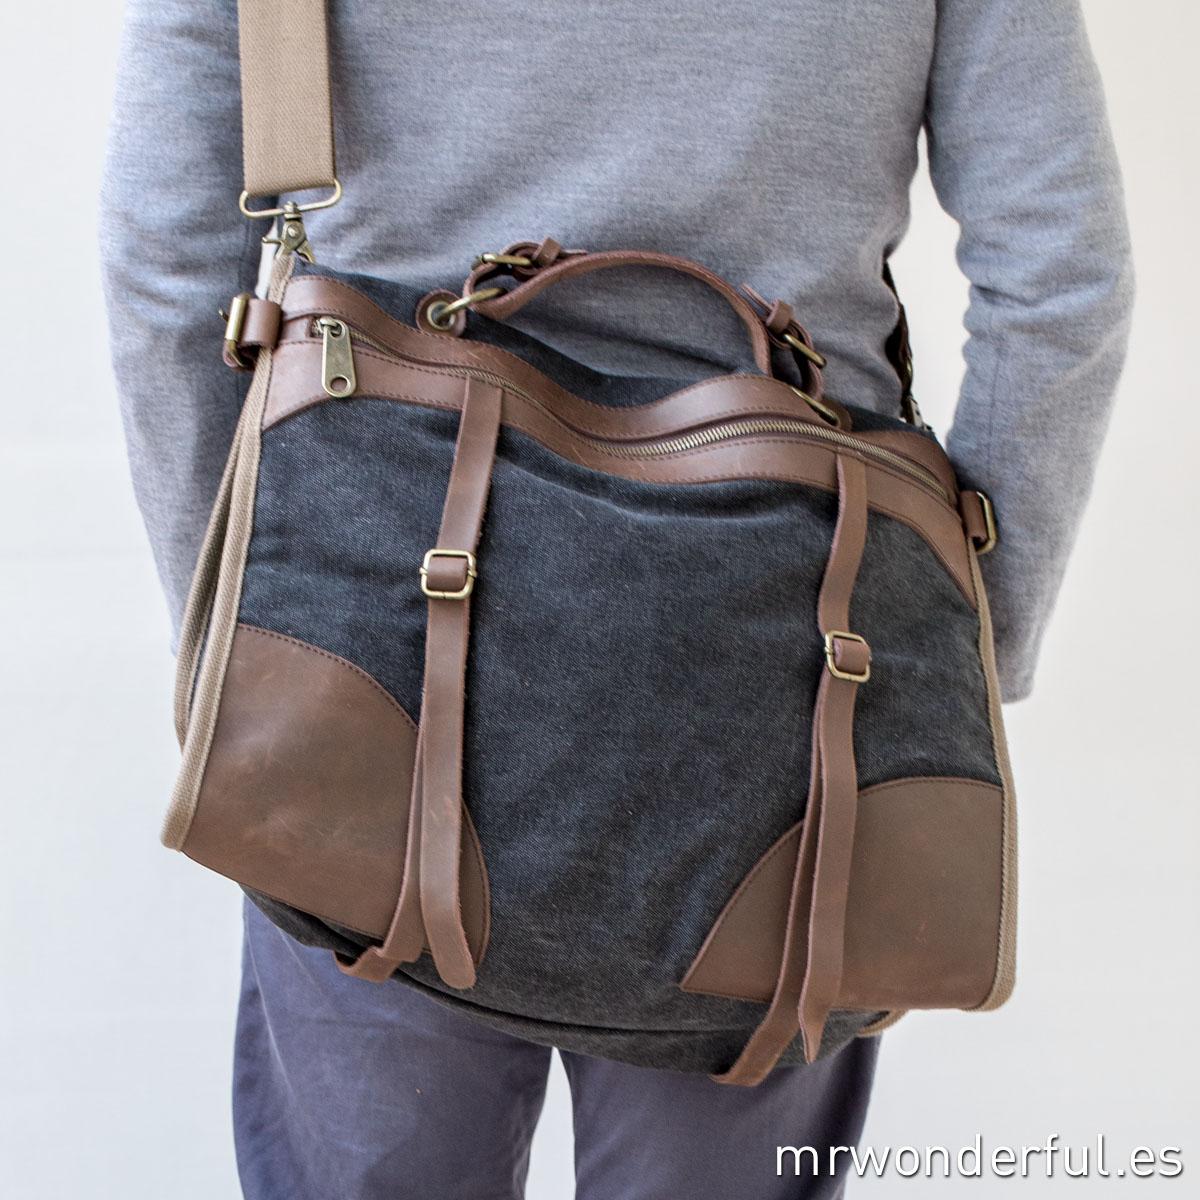 mrwonderful_bags_33074-Noir-27